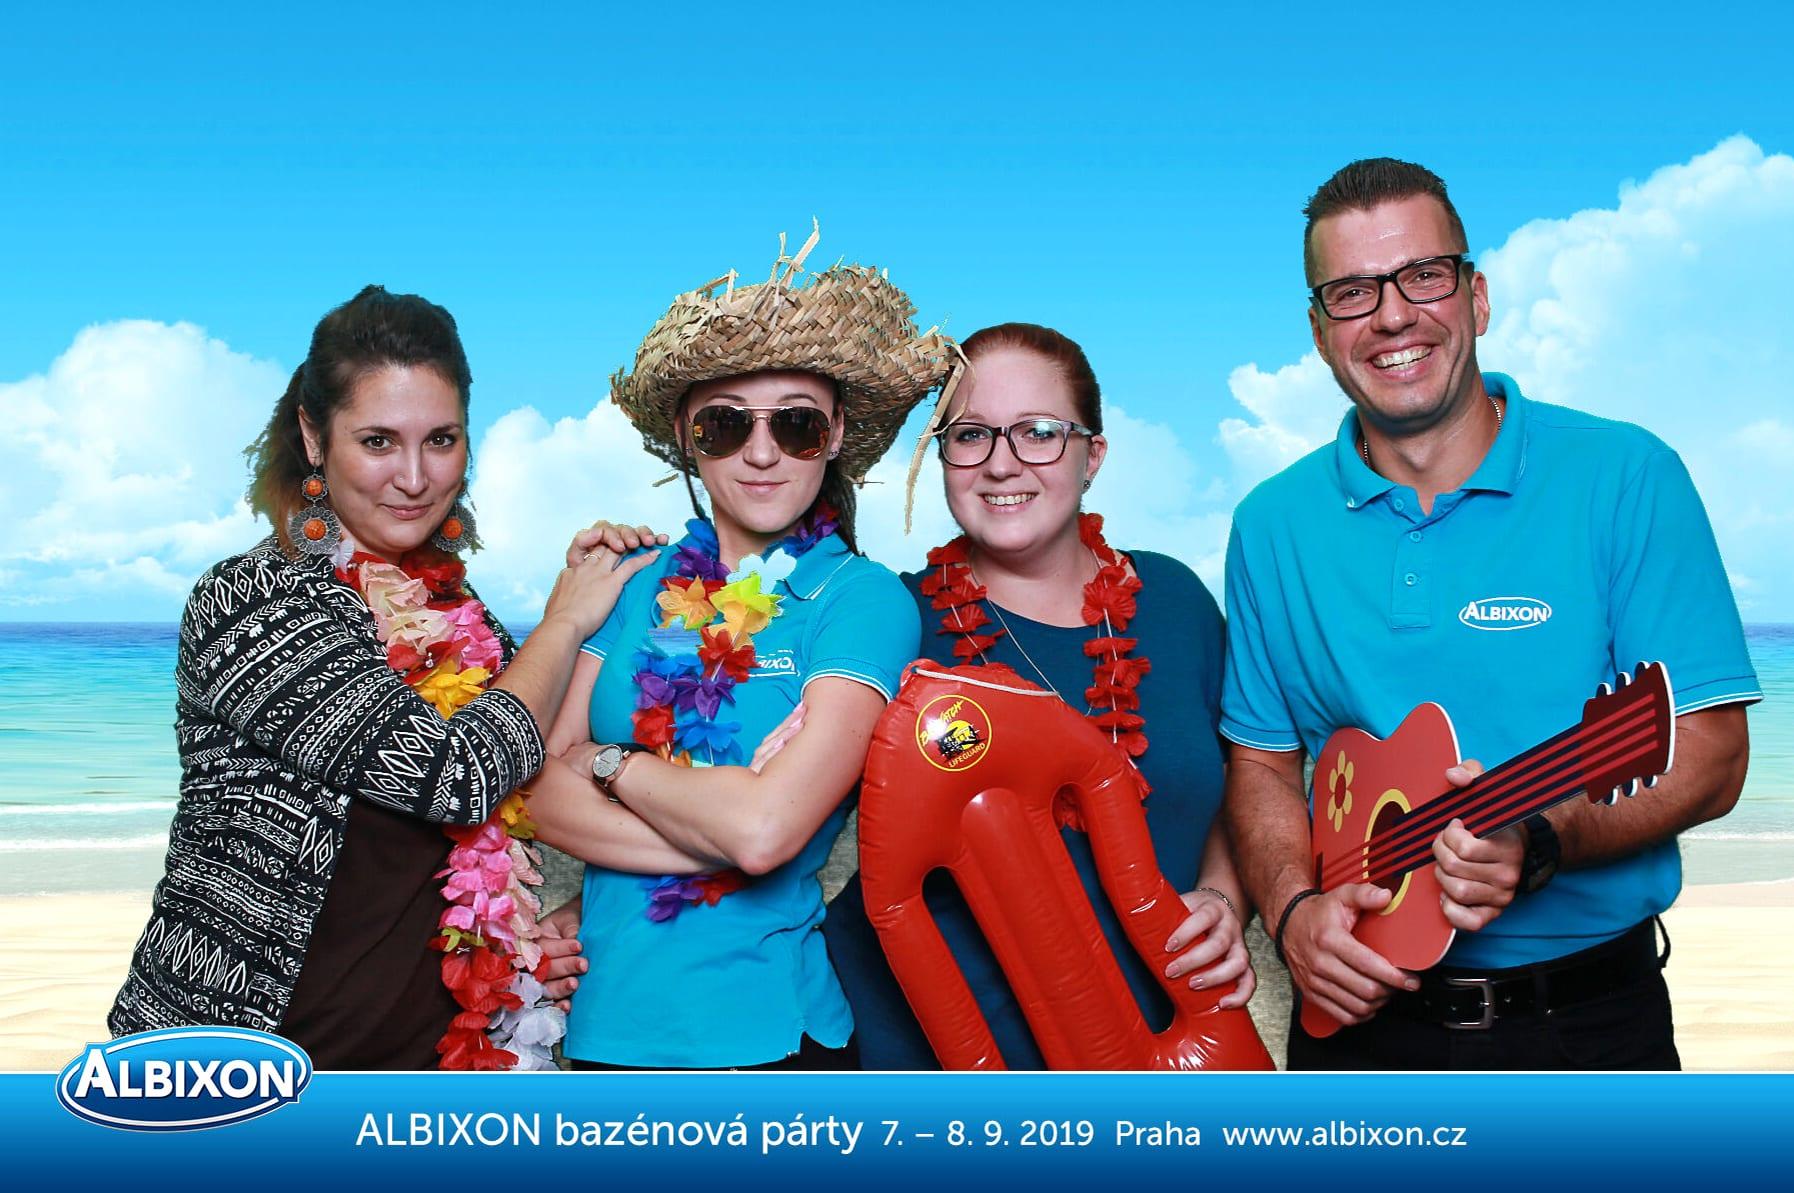 fotokoutek-praha-promo-akce-albixon-bazenova-party-8-9-2019-648080